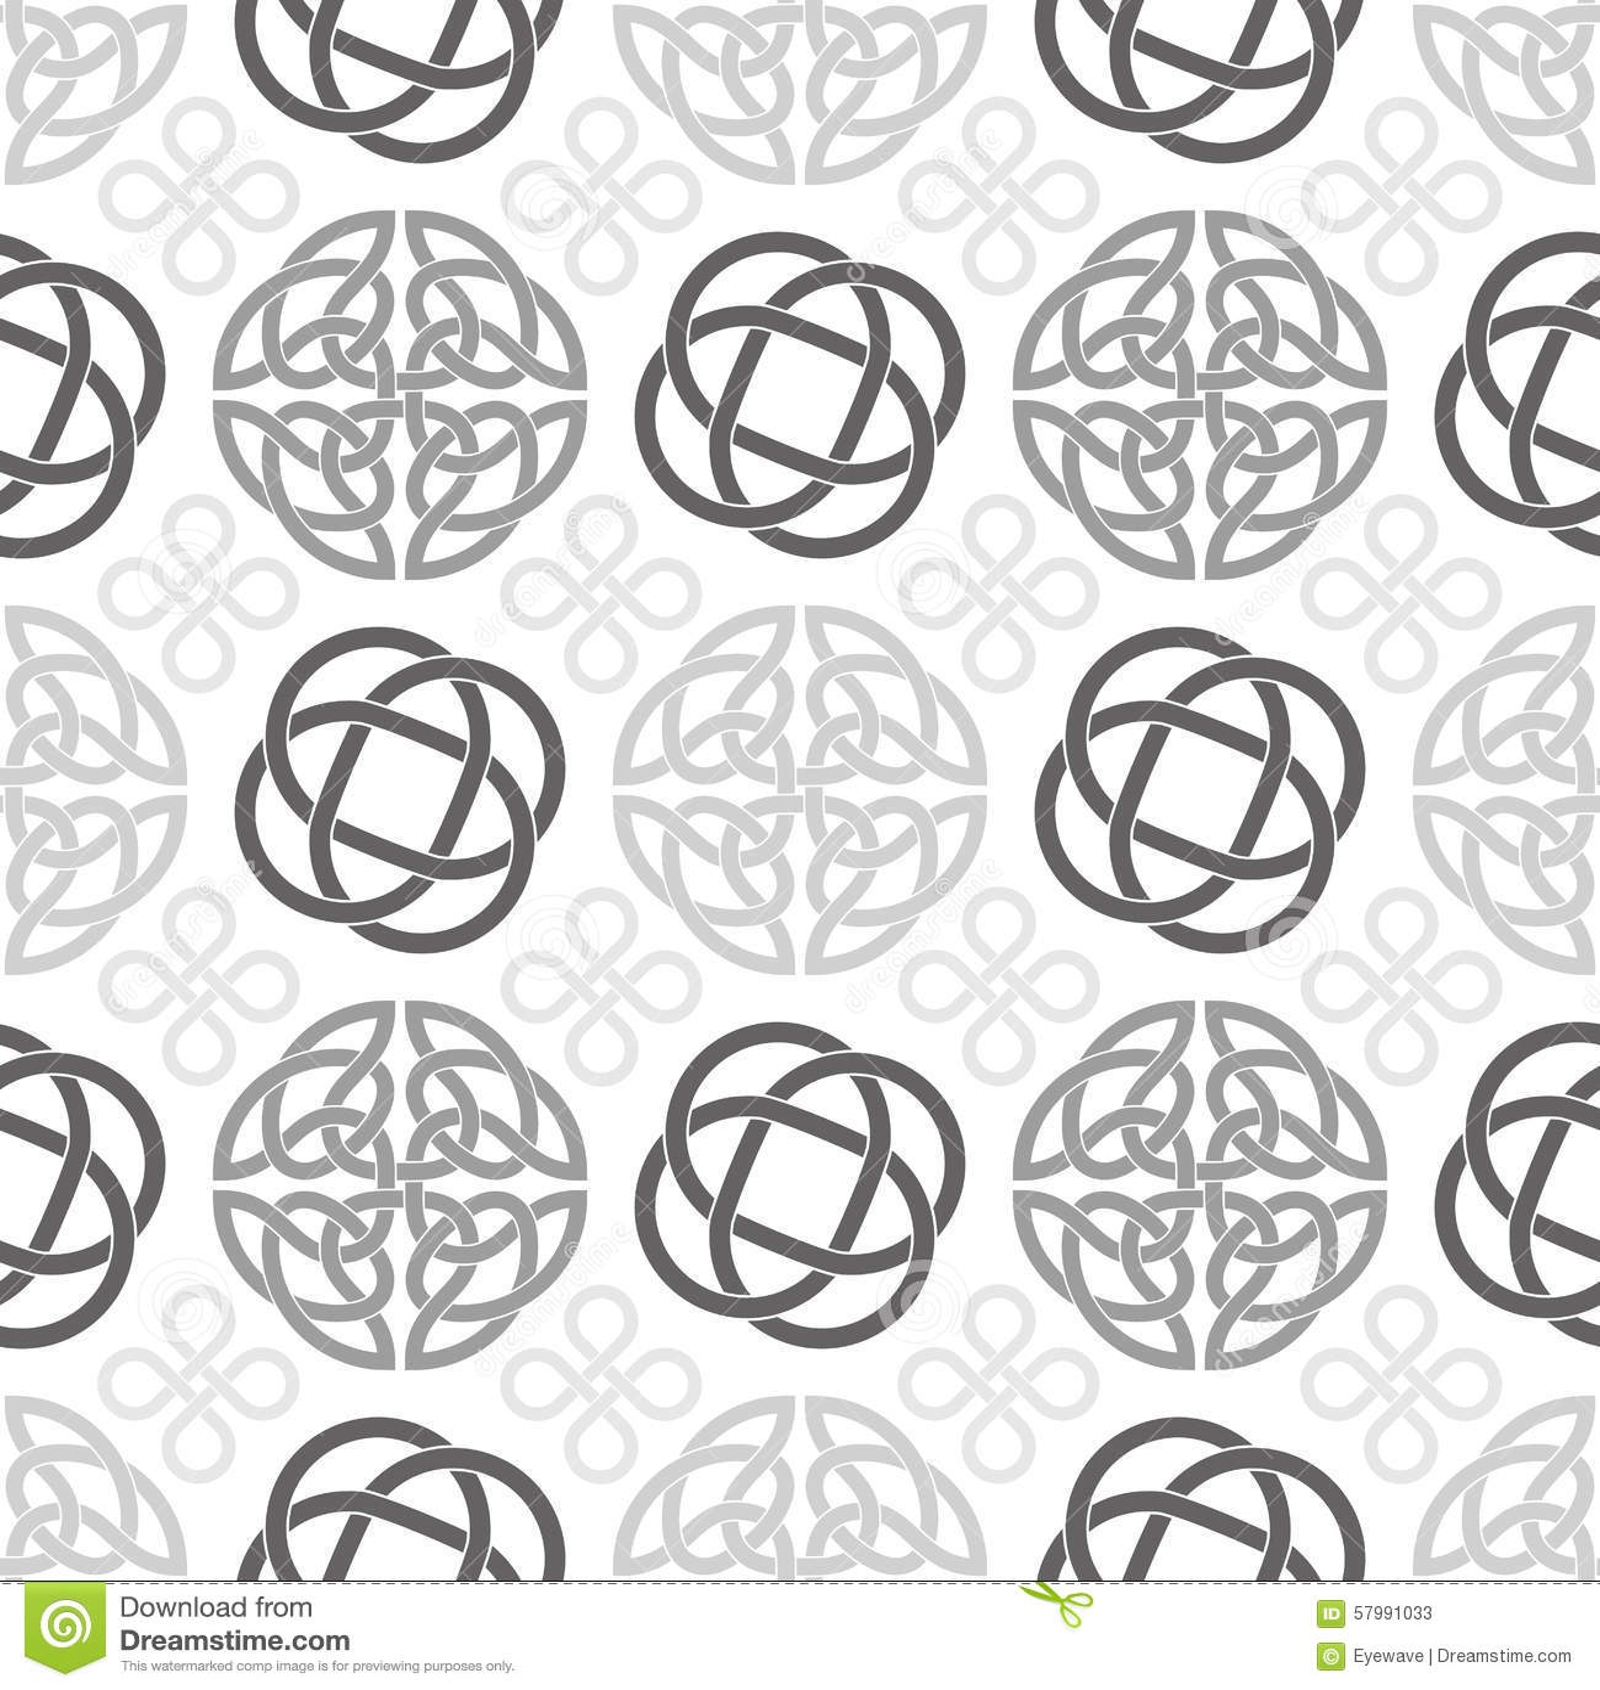 Celtic Knots Seamless Wallpaper Pattern Stock Vector ...